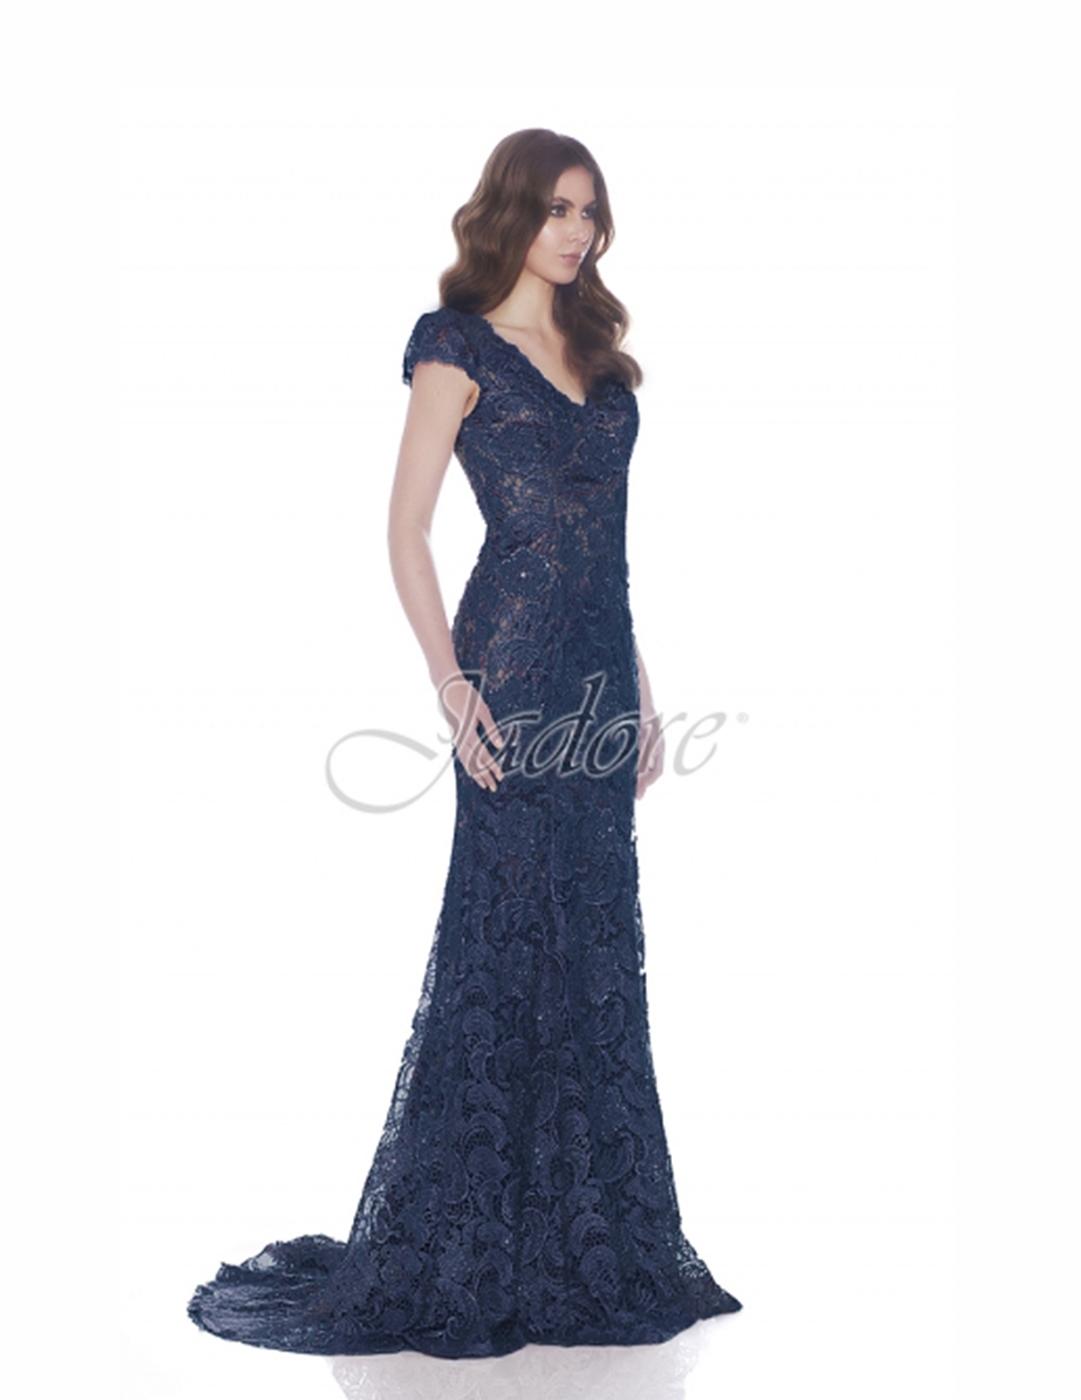 800a32ac964 Evening Dress by Jadore Jadore J7 Collection - J7109